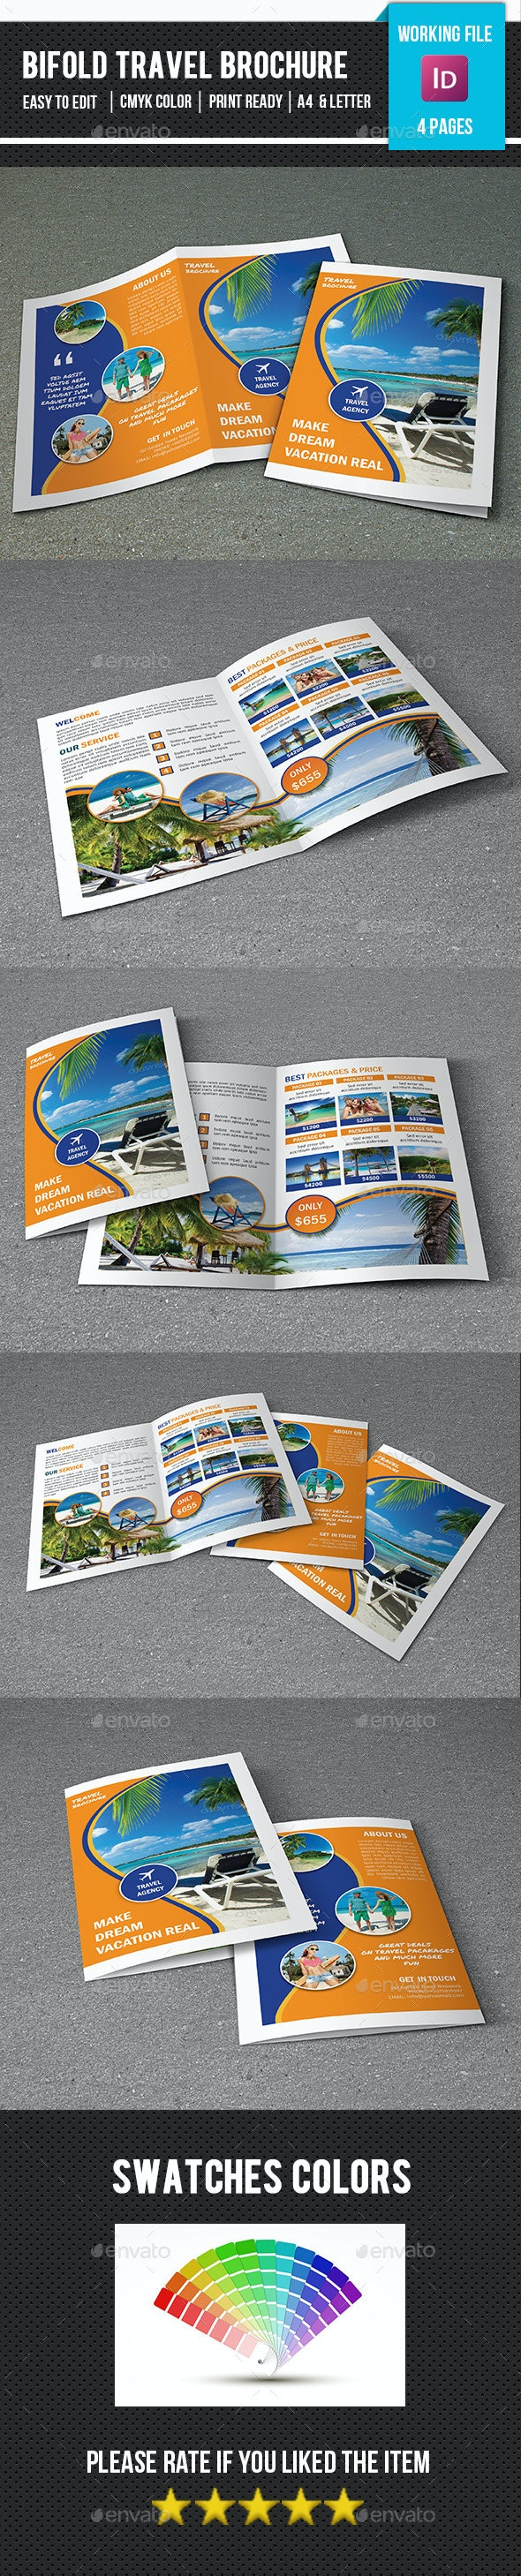 Travel Tour Brochure Template-V364 - Corporate Brochures